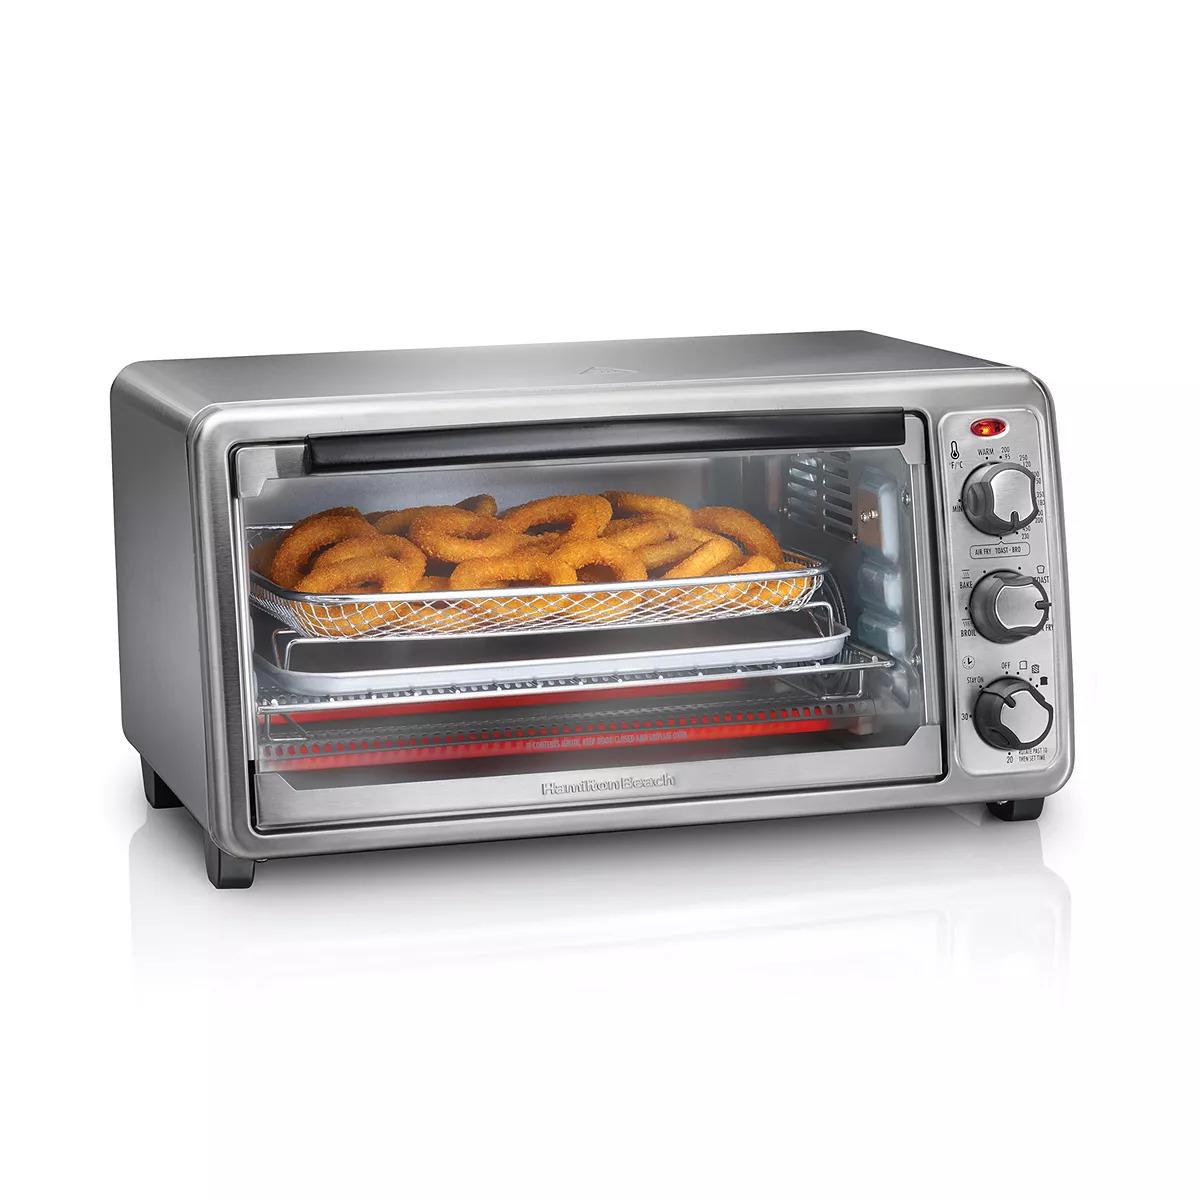 Hamilton Beach Sure-Crisp Air Fryer Toaster Oven 31413